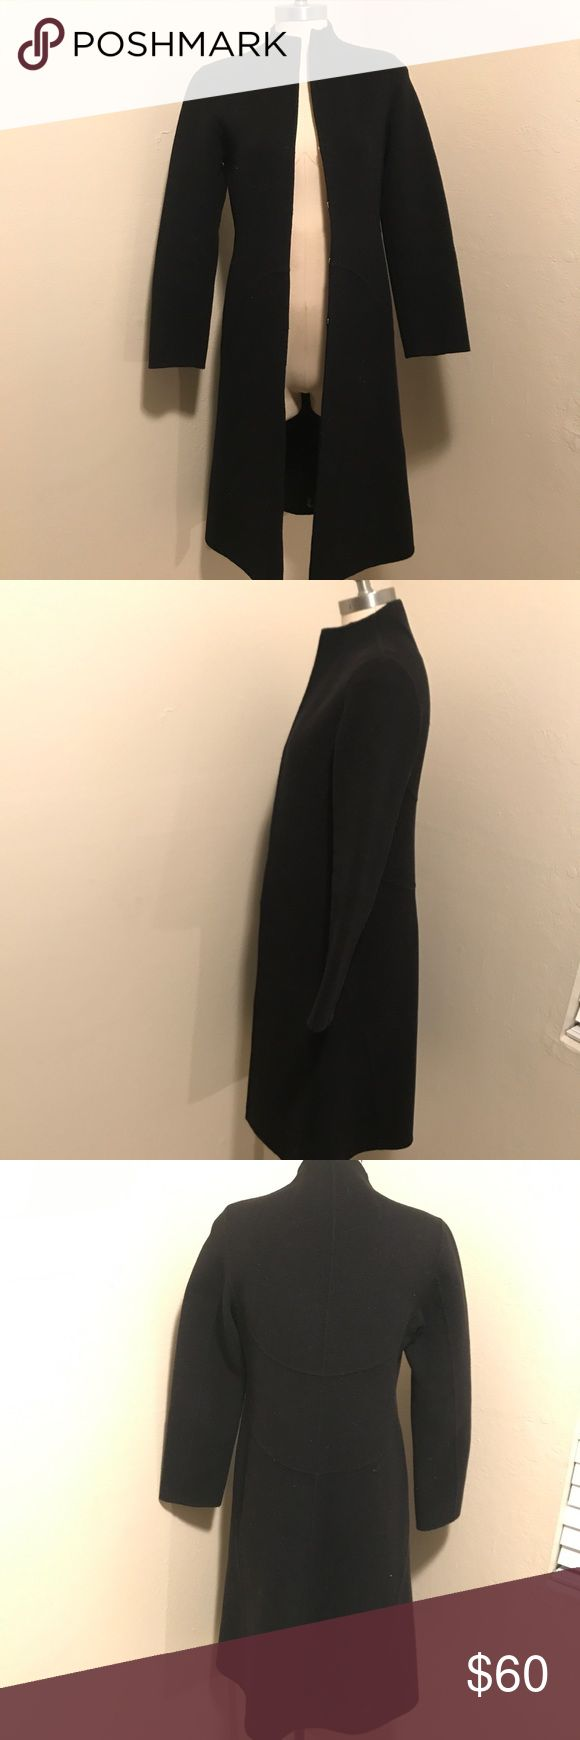 DKNY 100% wool women's clasp trench coat size 2 DKNY women's size 2 100% wool black long sleep center front clasp Closure trench coat Dkny Jackets & Coats Trench Coats